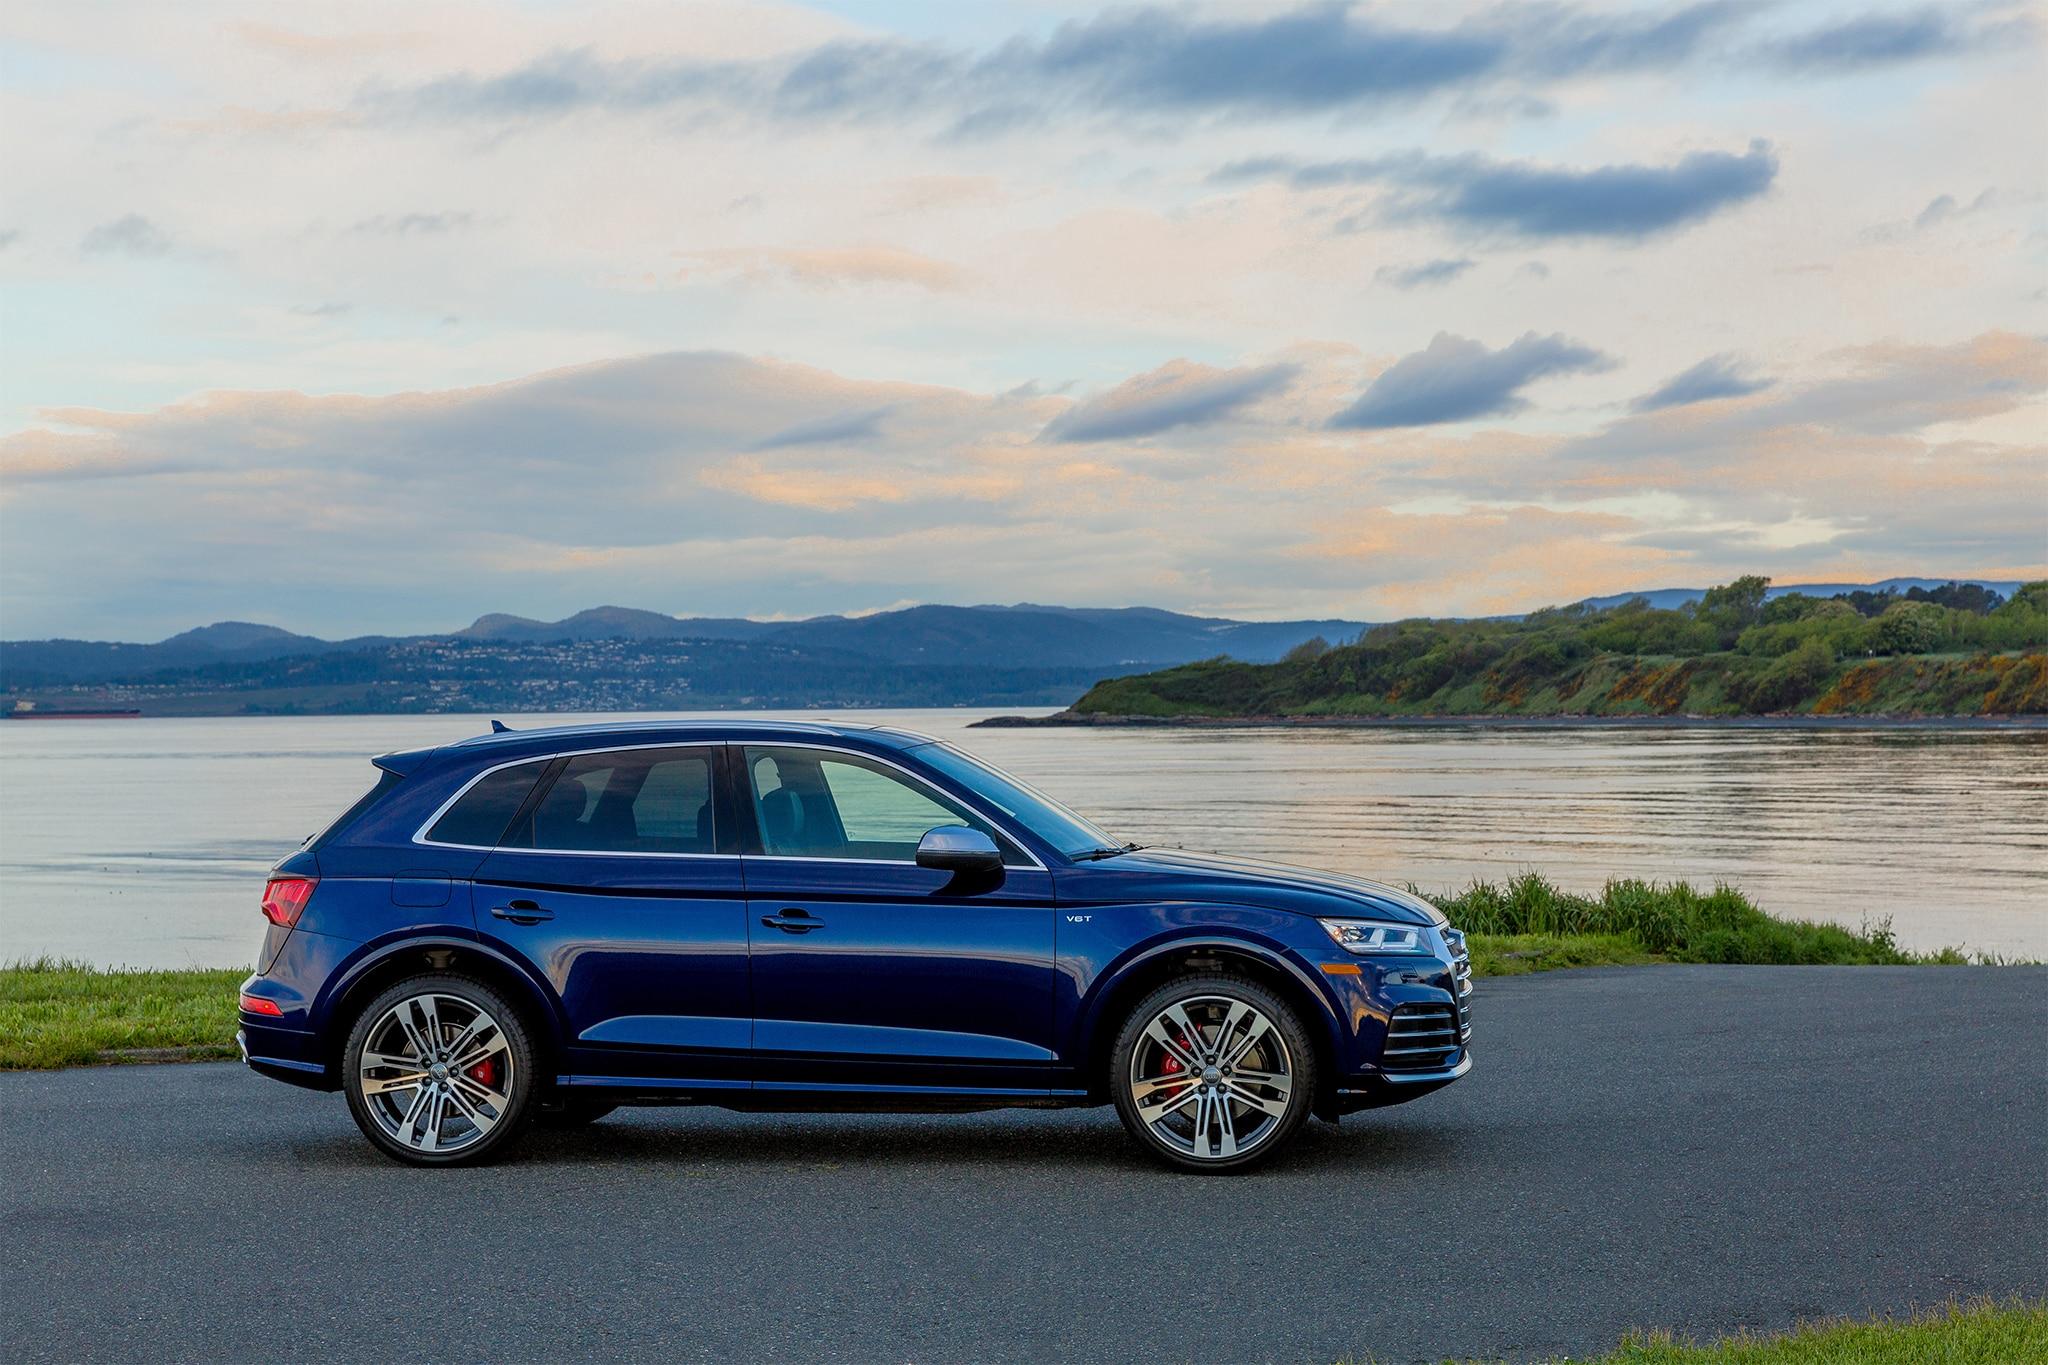 Audi Sq Review New Car Models - Audi sq5 review